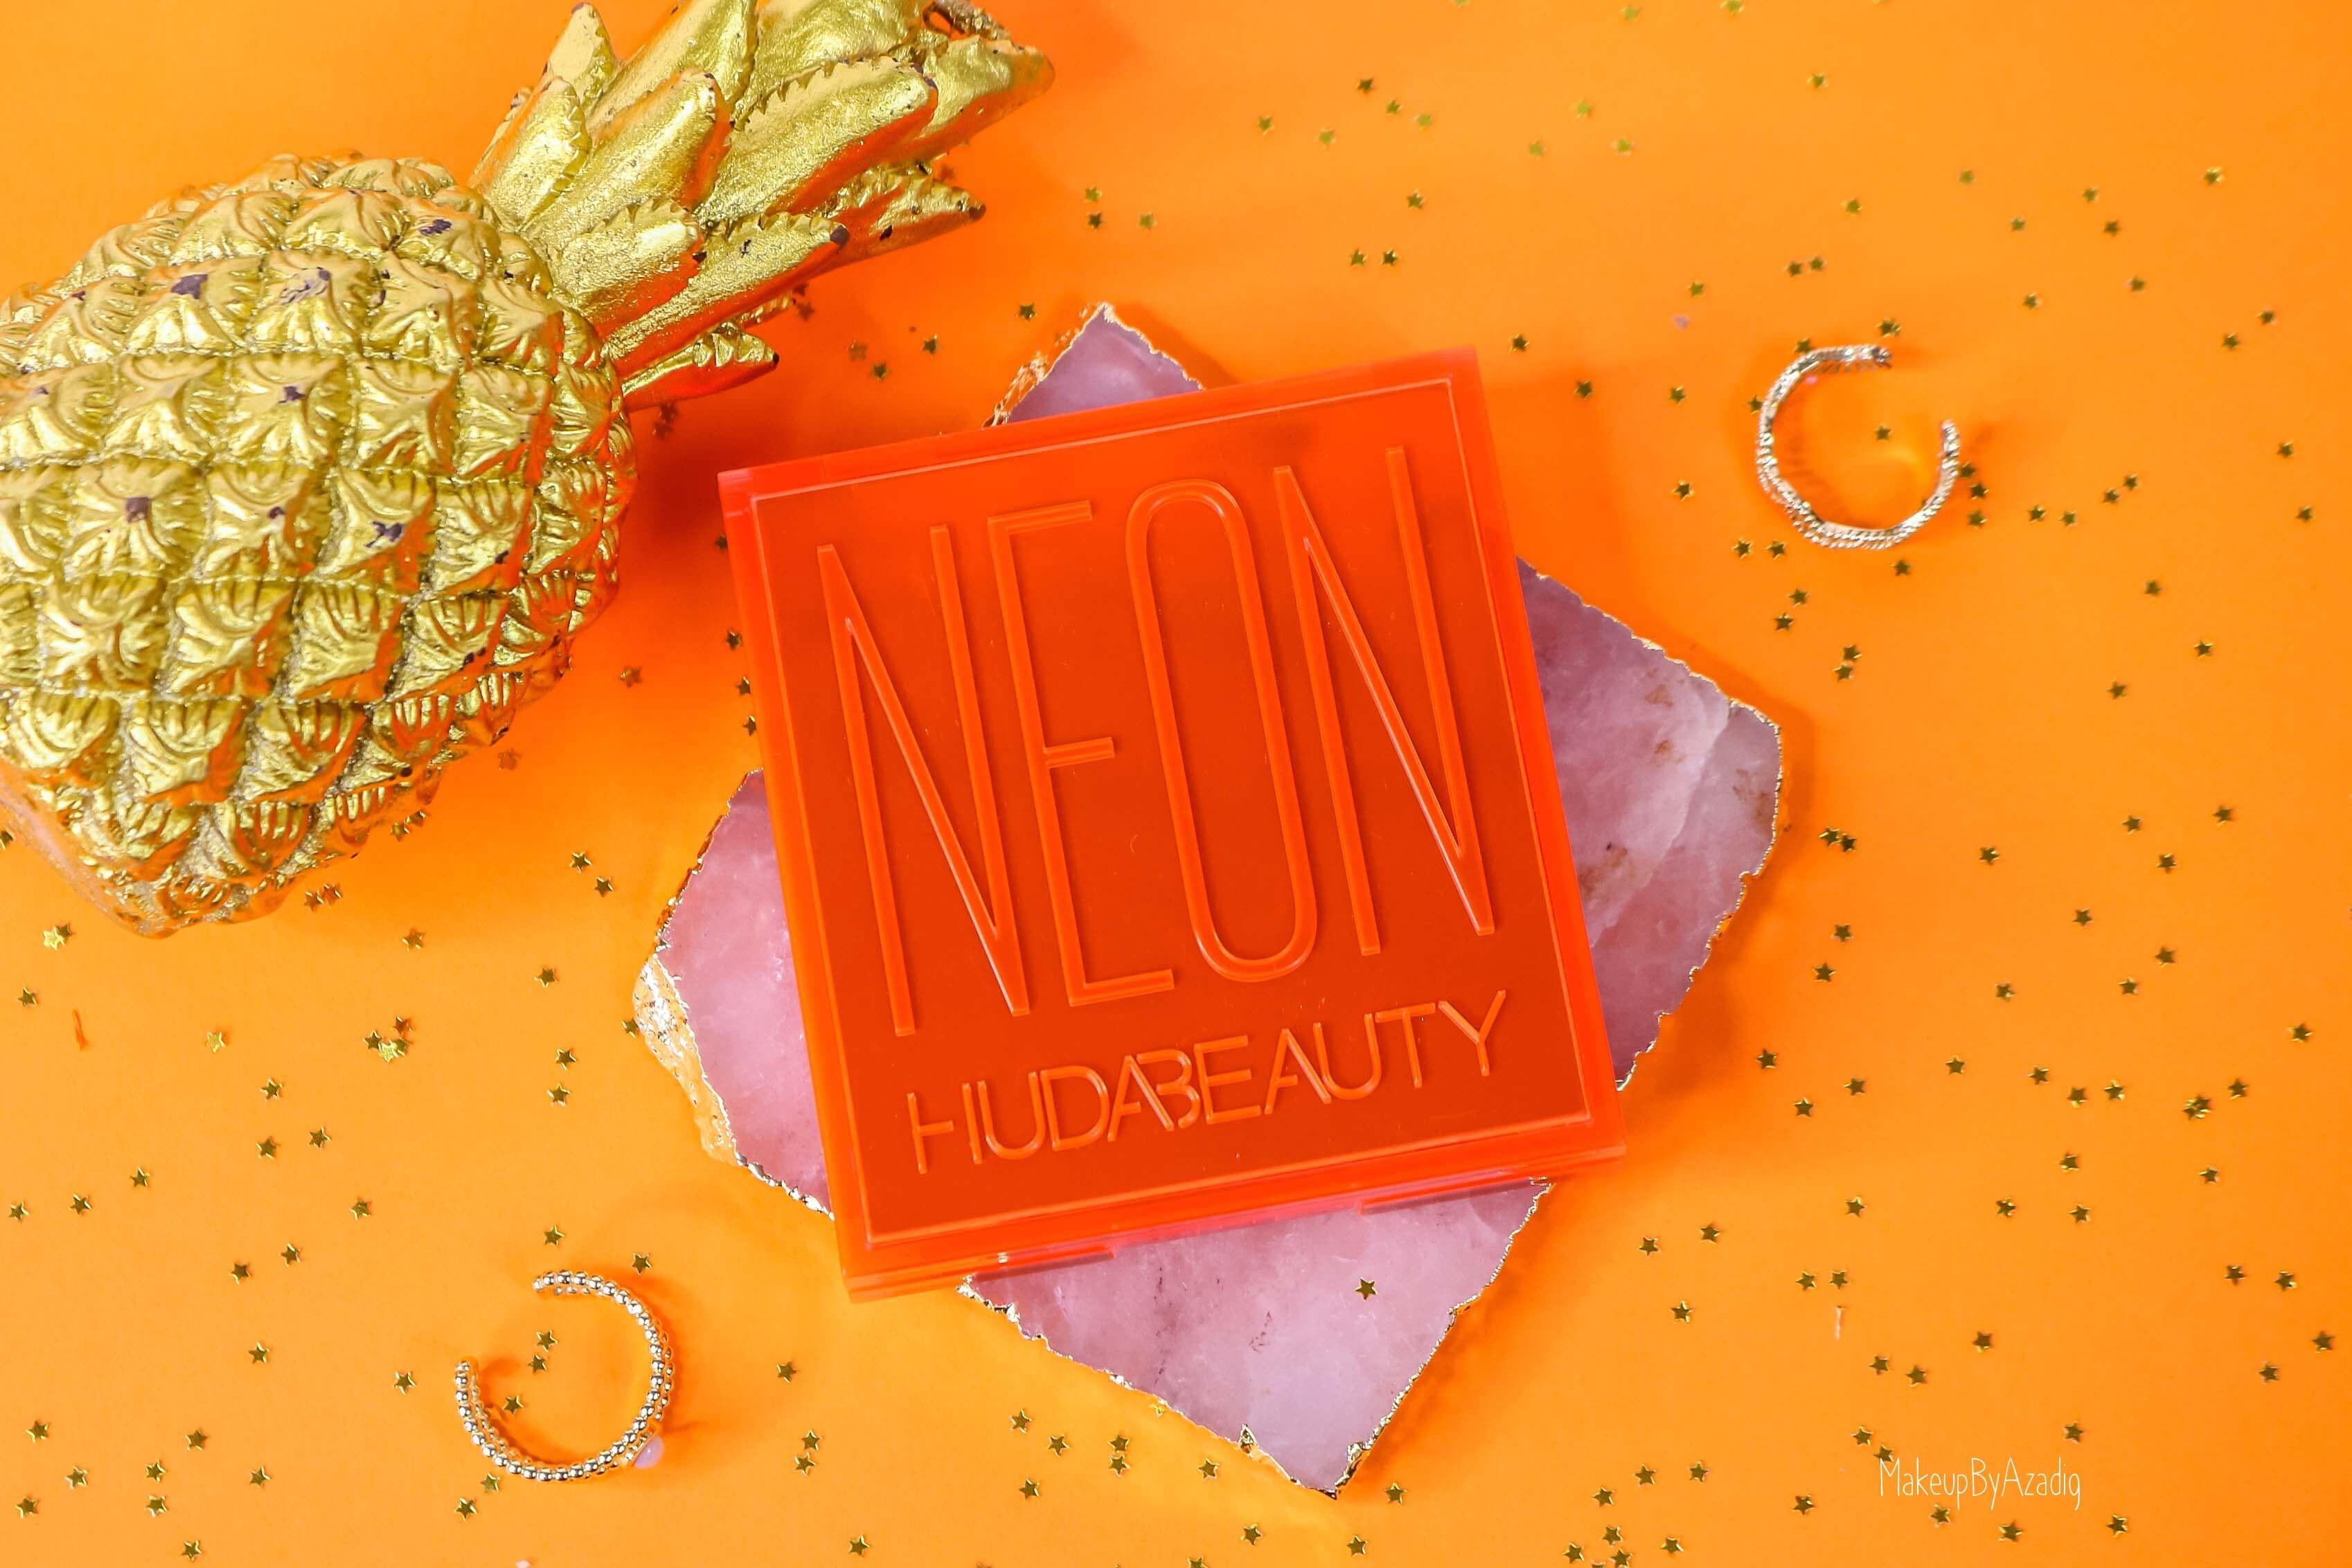 revue-review-palette-neon-obsession-huda-beauty-orange-pink-green-neon-palette-fard-paupieres-fluo-swatch-avis-prix-makeupbyazadig-packaging